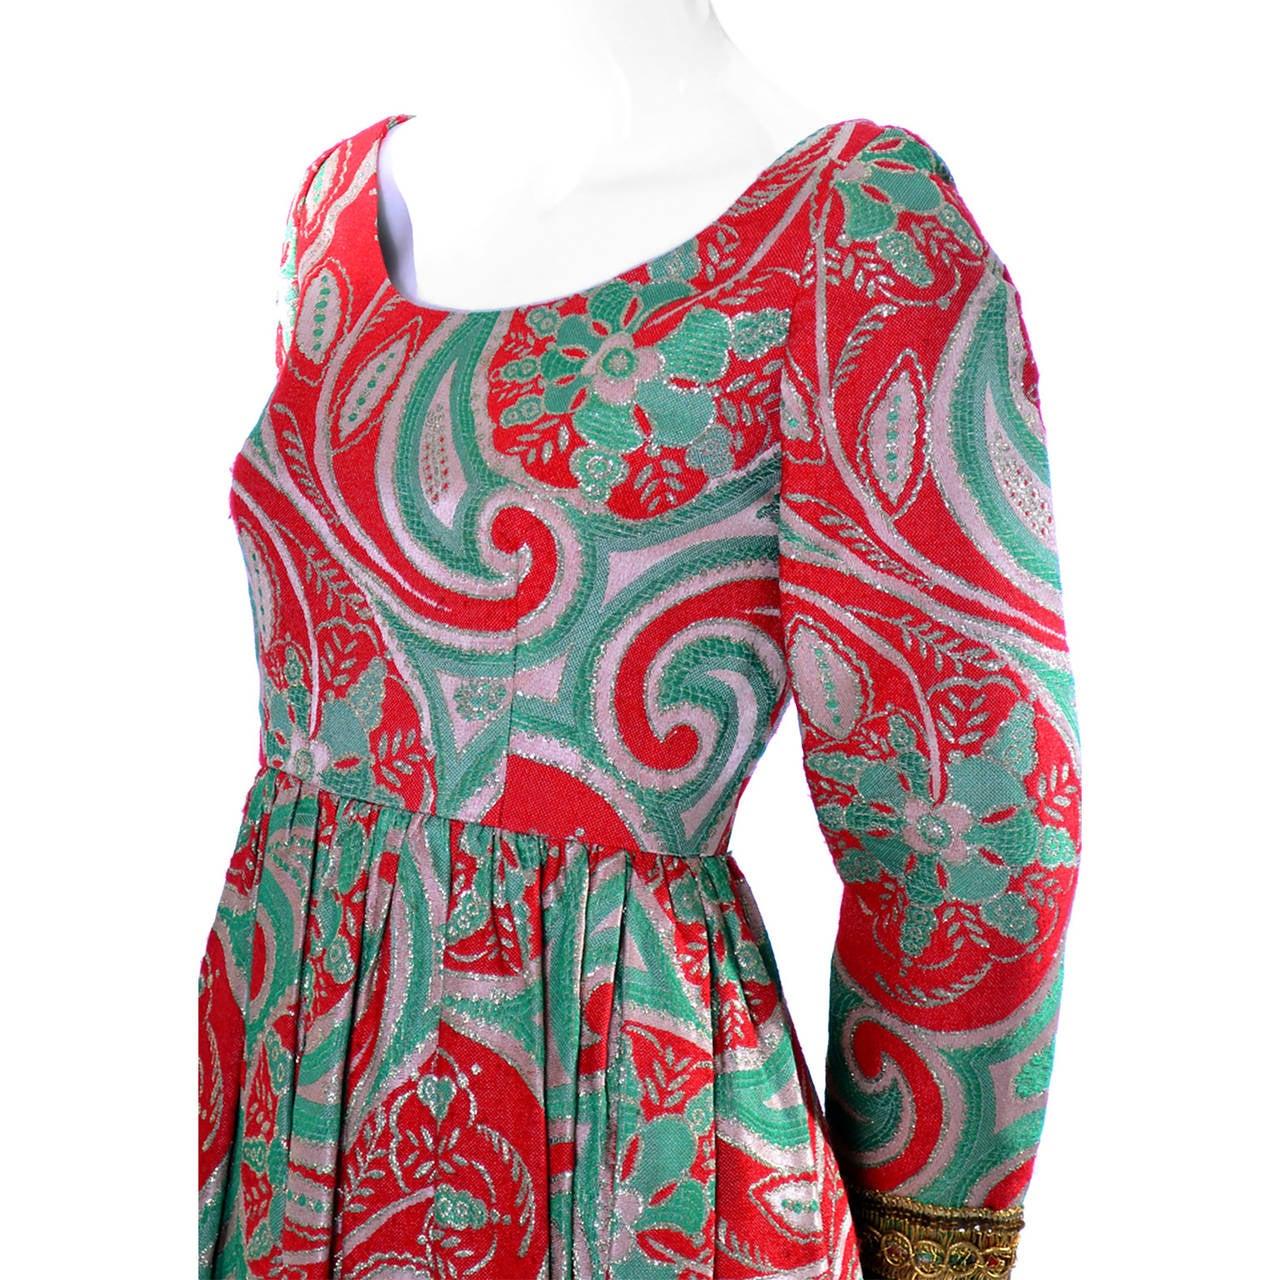 Oscar de la Renta Dress Boutique Vintage Dress 1960s Metallic Paisley Maxi In Excellent Condition For Sale In Portland, OR